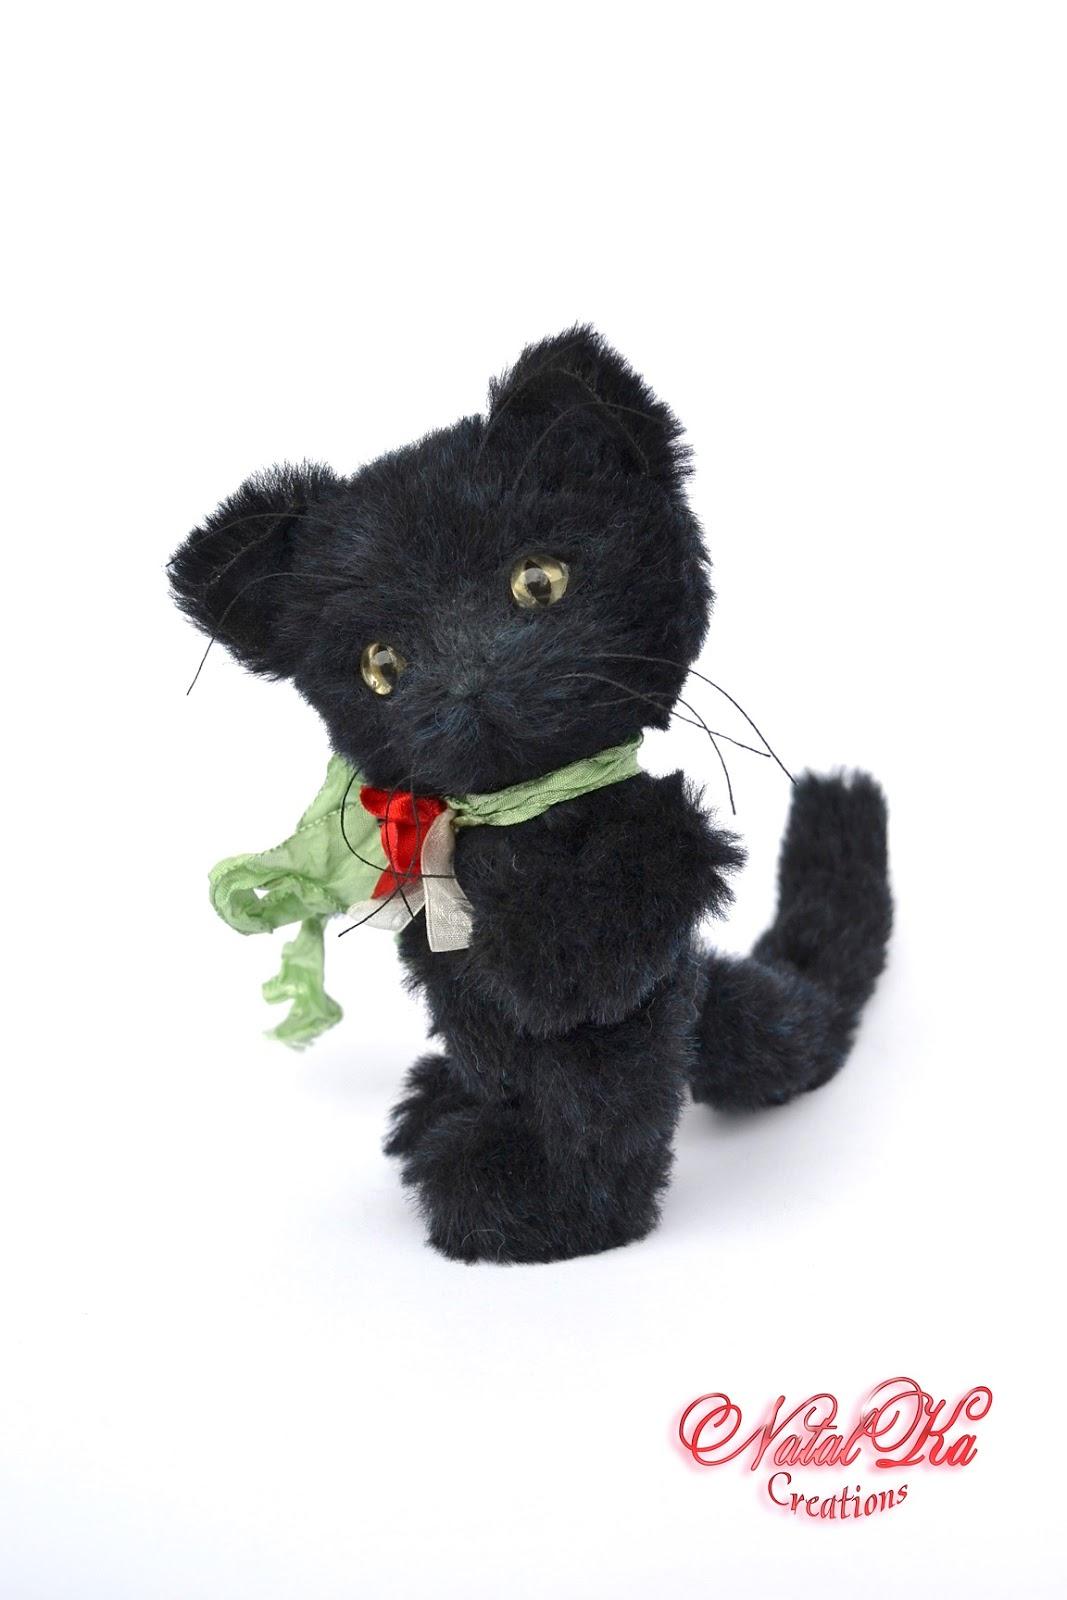 Авторский черный кот тедди, единственный экземпляр, ручная работа, artist teddy cat, jointed teddy, black cat, handmade teddy, Künstlerteddy, Künstler Kater, Mohair, NatalKa Creations